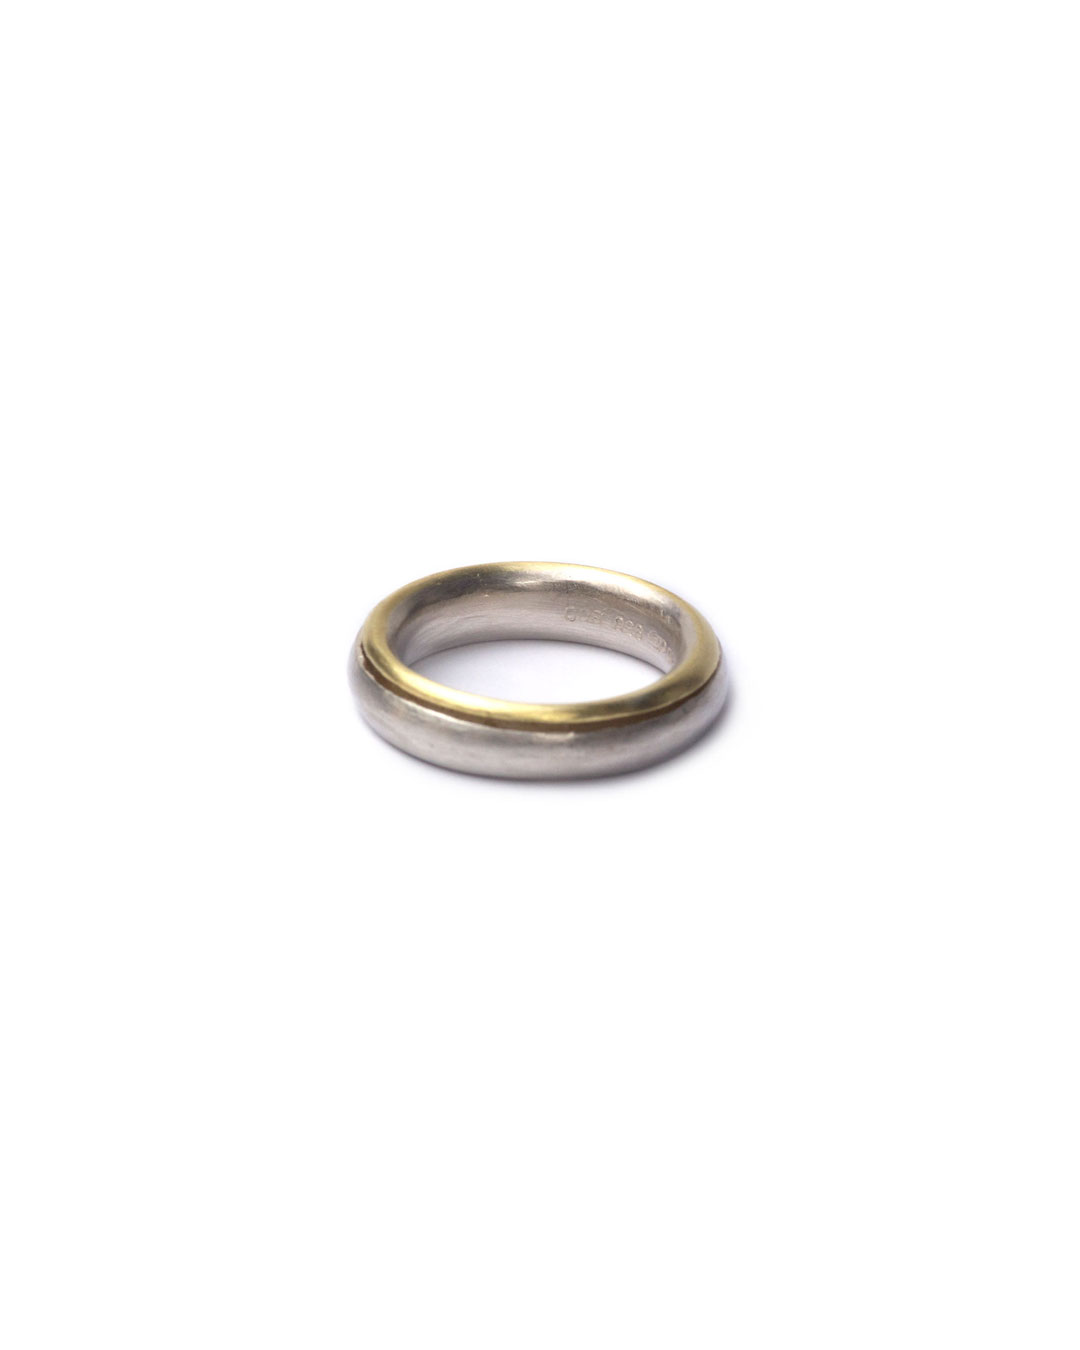 Okinari Kurokawa, untitled, 1998, ring; 970 silver, 900 gold, ø 22 x 5 mm